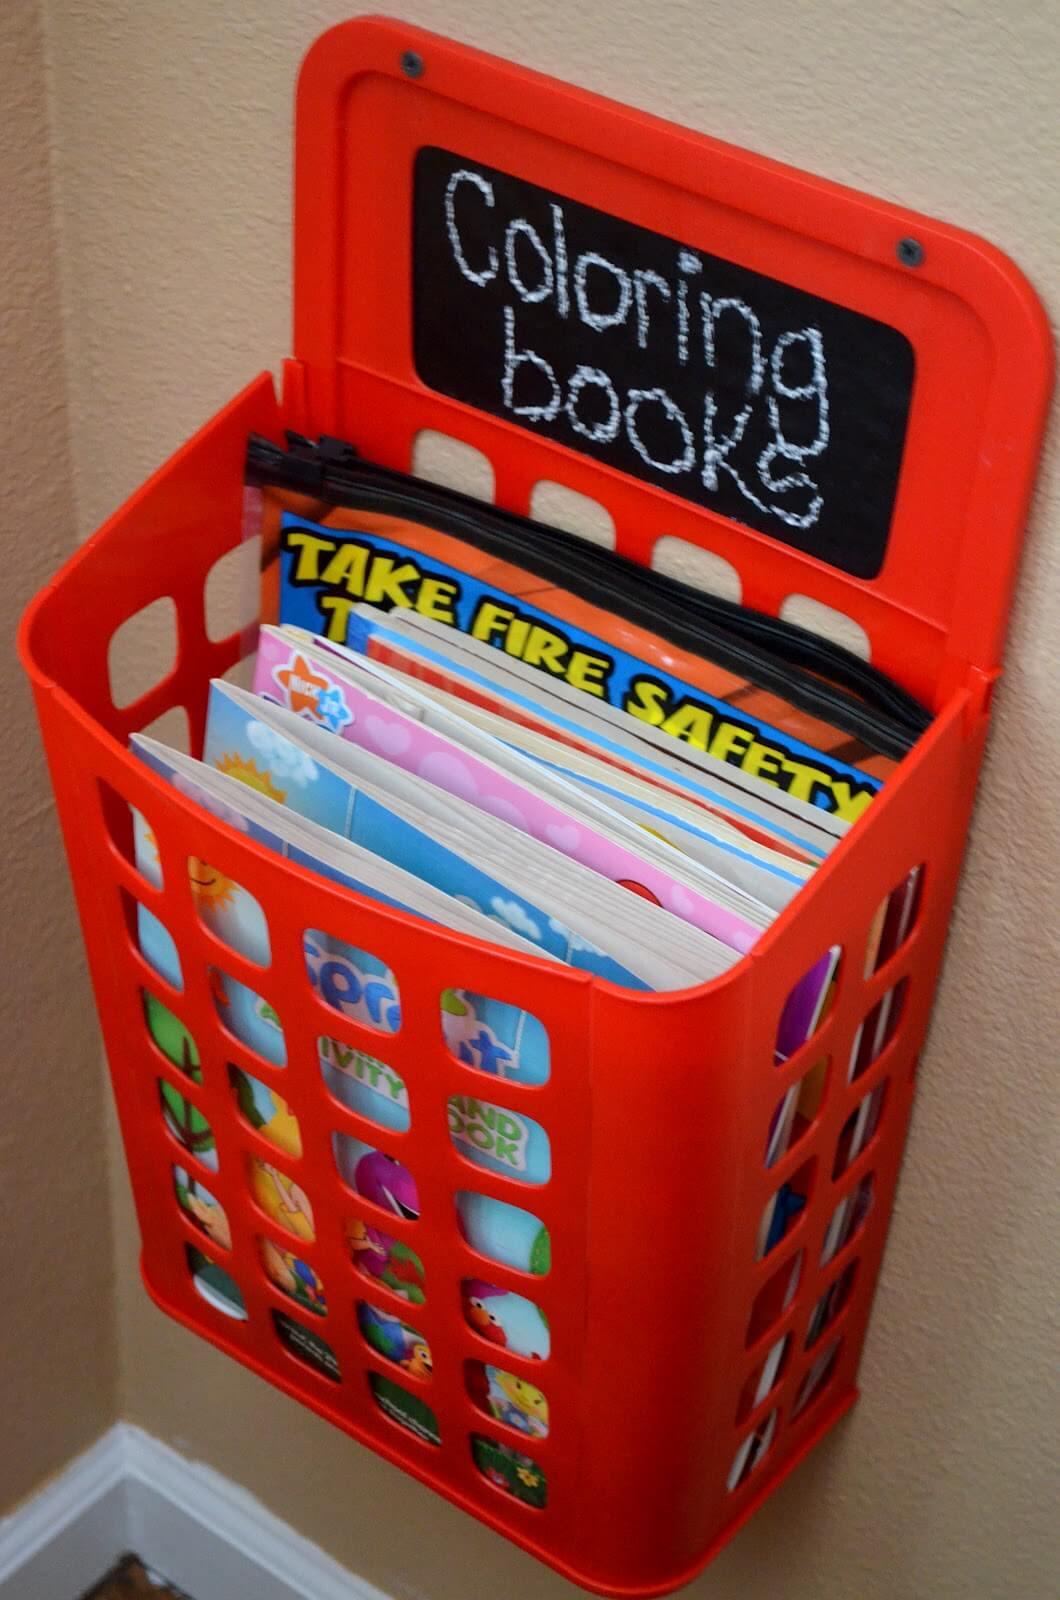 Fun Wall-Mounted Coloring Book Corral